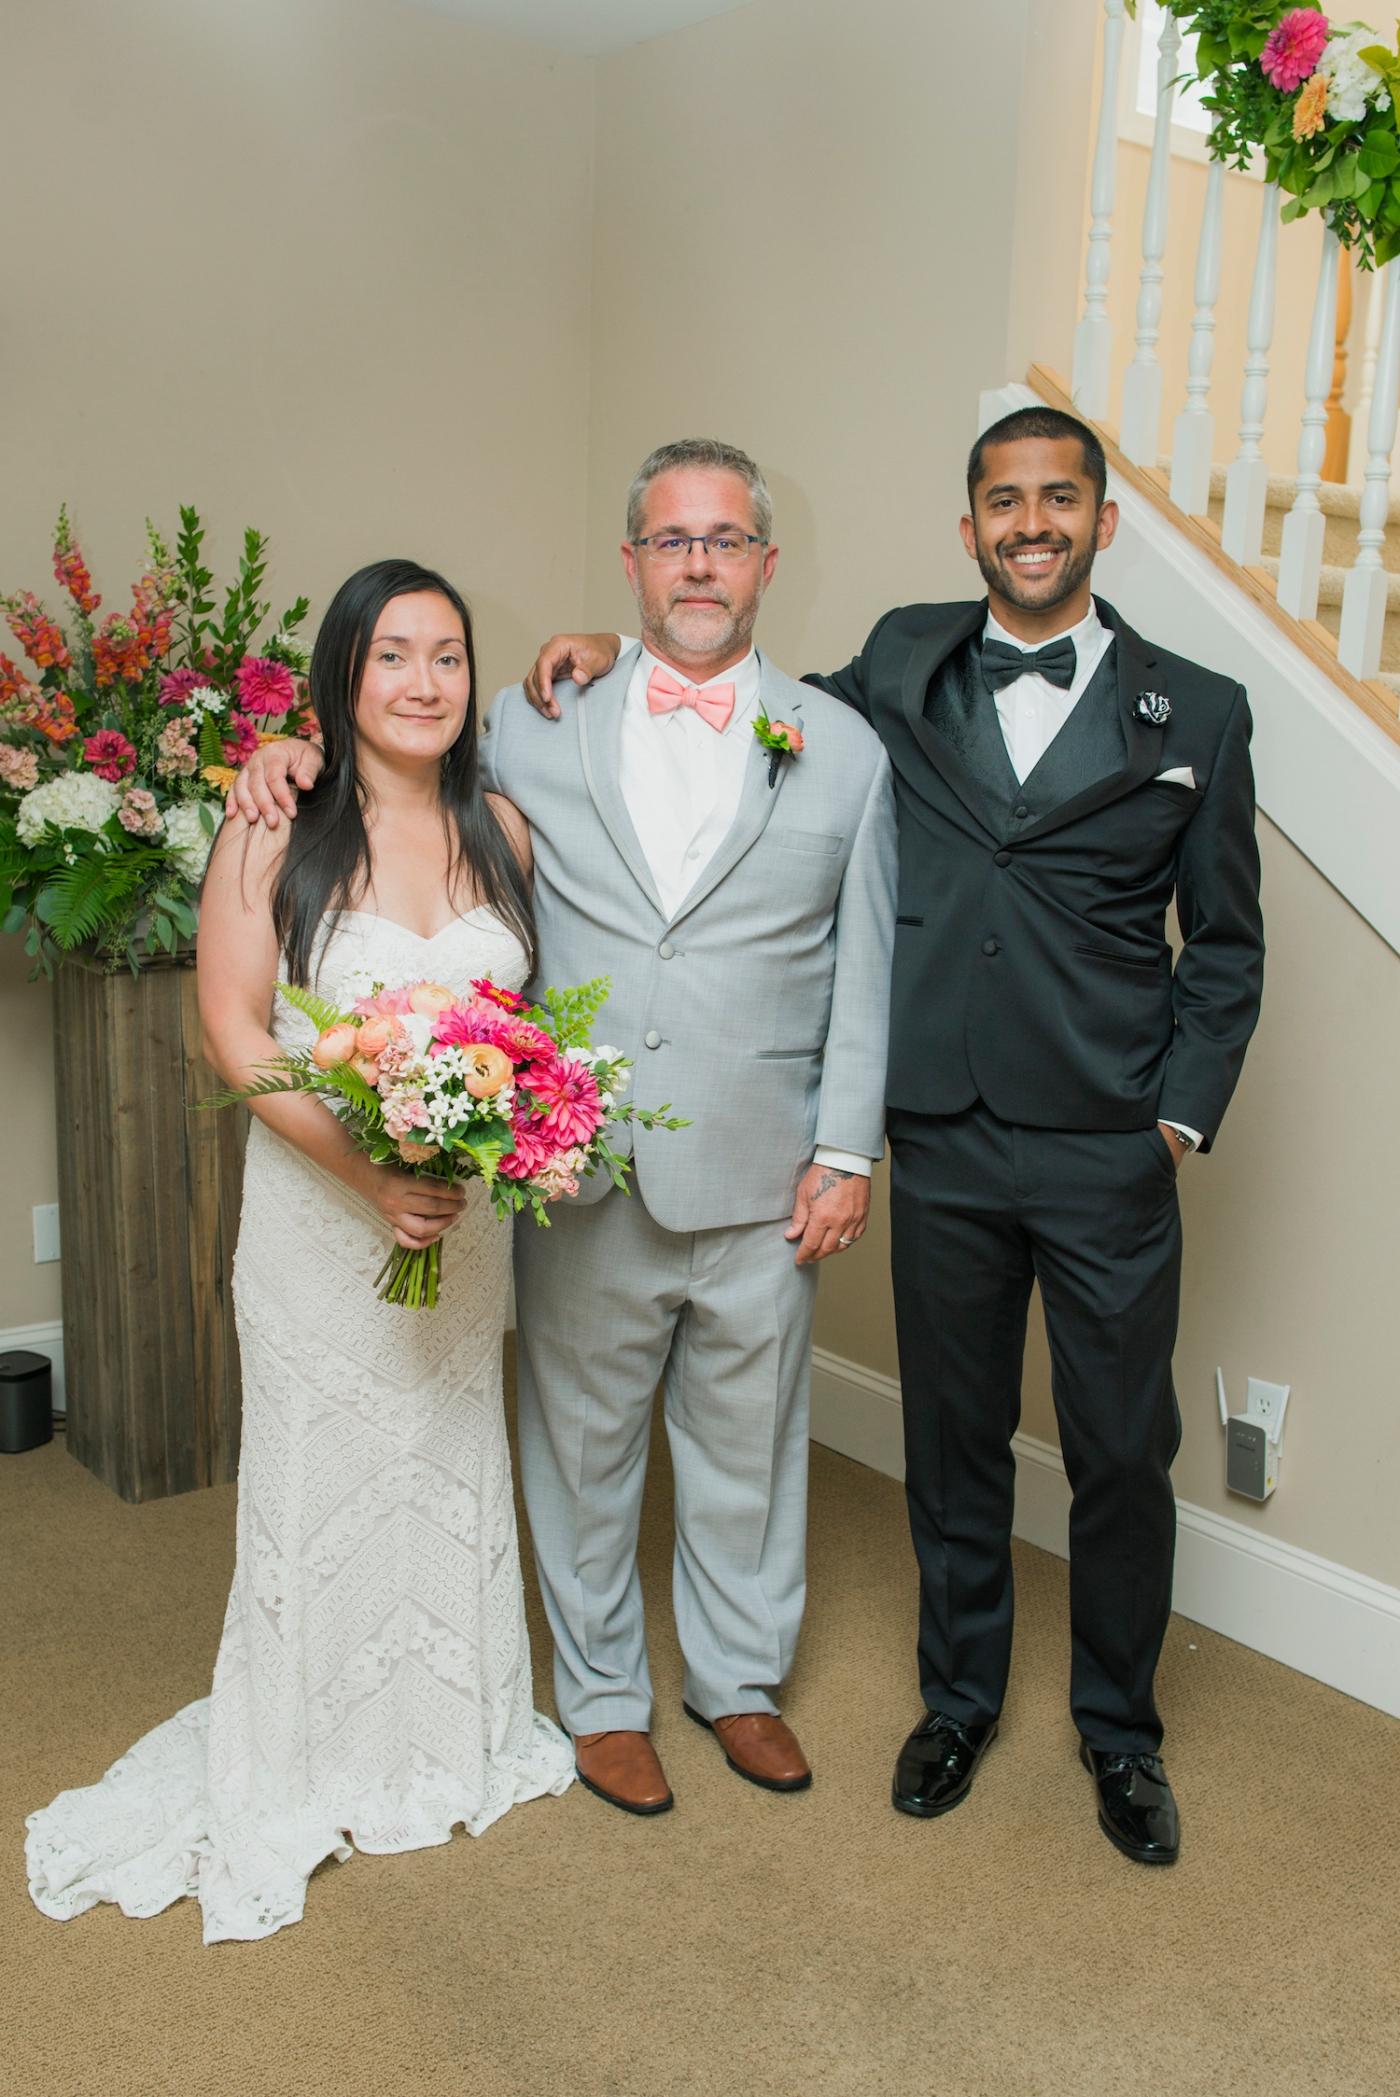 DSC_4829Trav-Marit-2017-wedgallery-